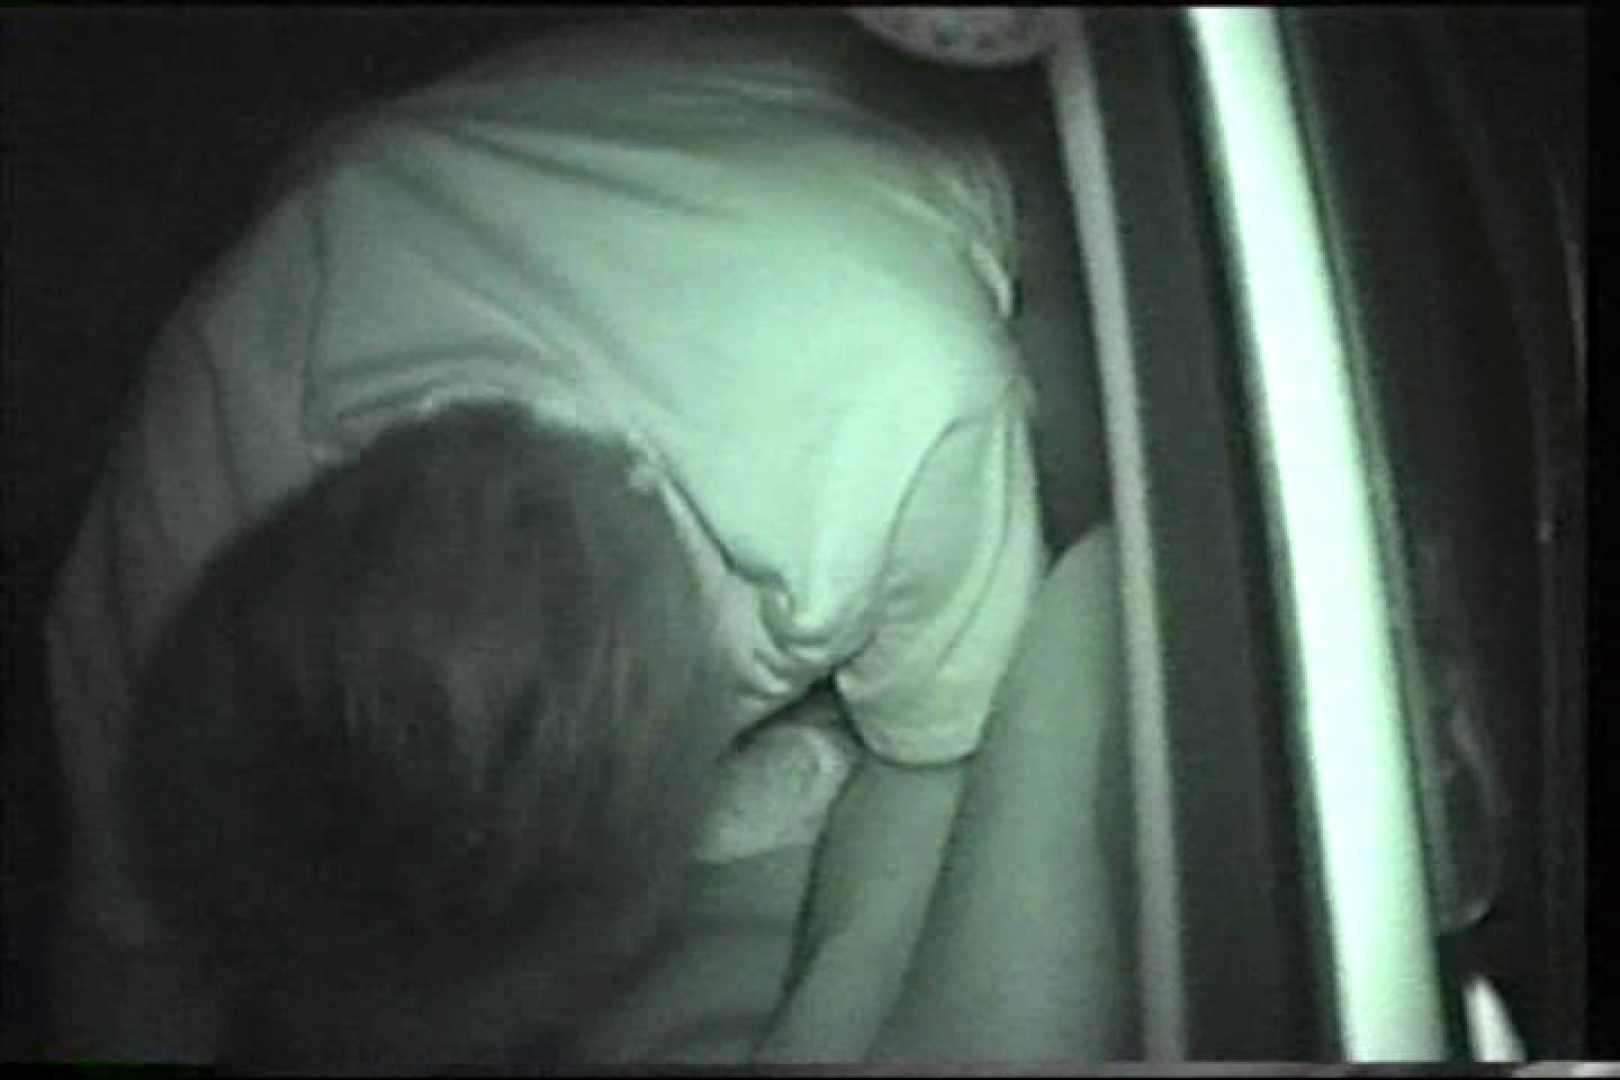 MASAさんの待ち伏せ撮り! 赤外線カーセックスVol.2 濃厚セックス 隠し撮りオマンコ動画紹介 22PICs 10